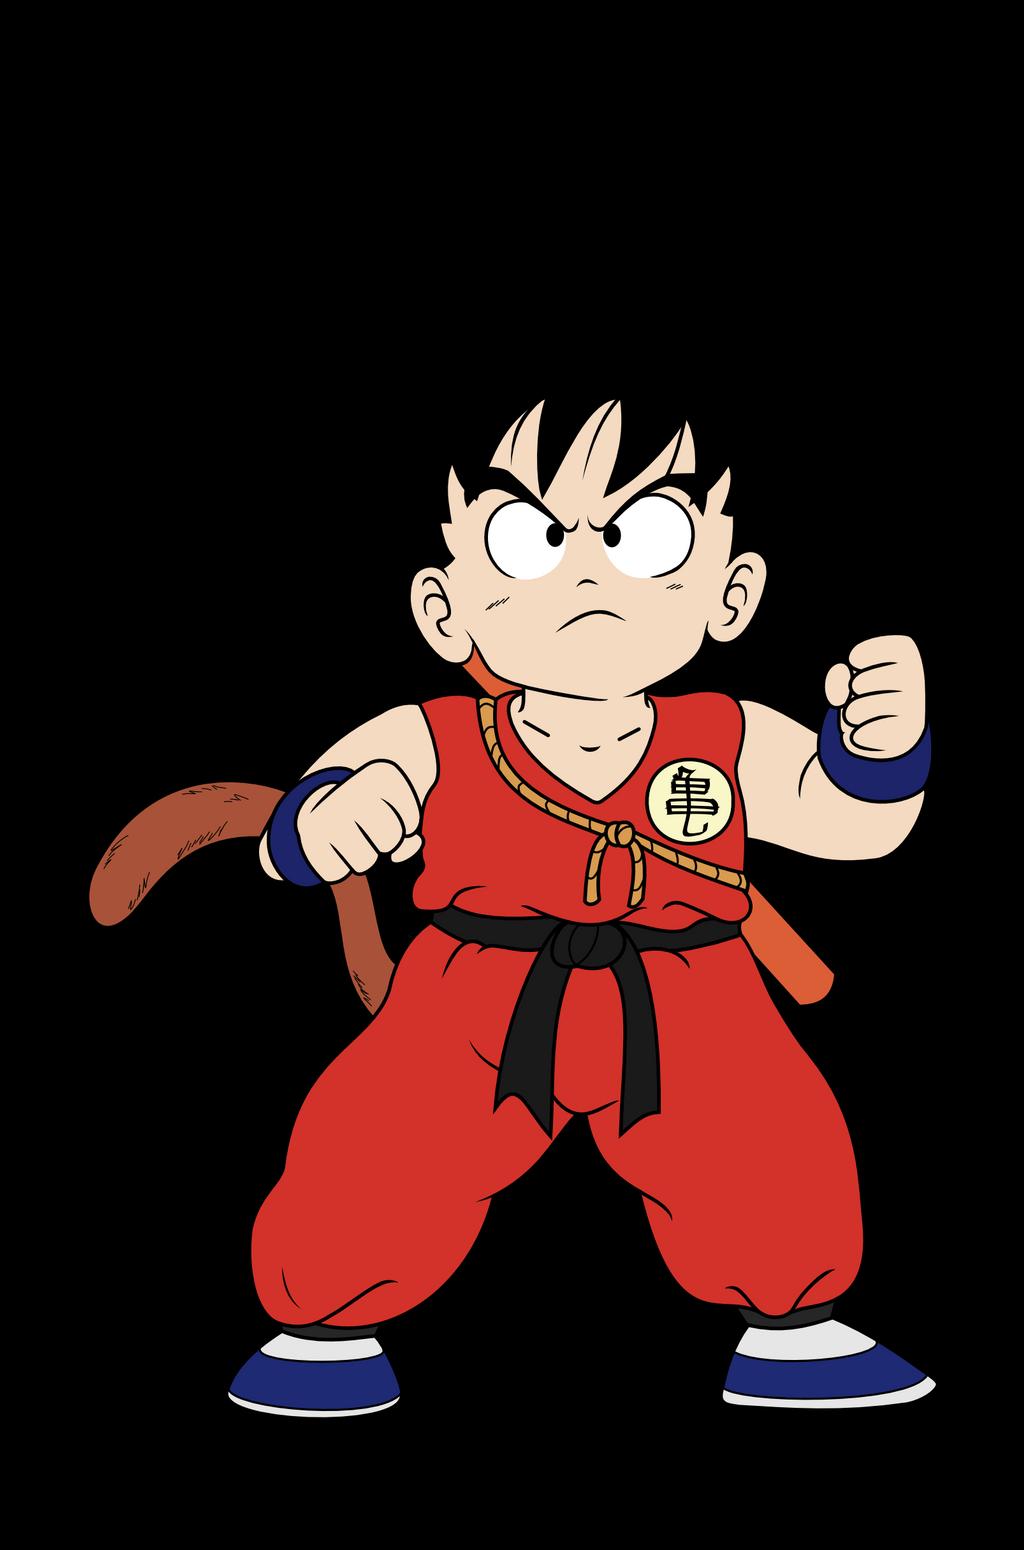 Goku vector by Tikonka on DeviantArt